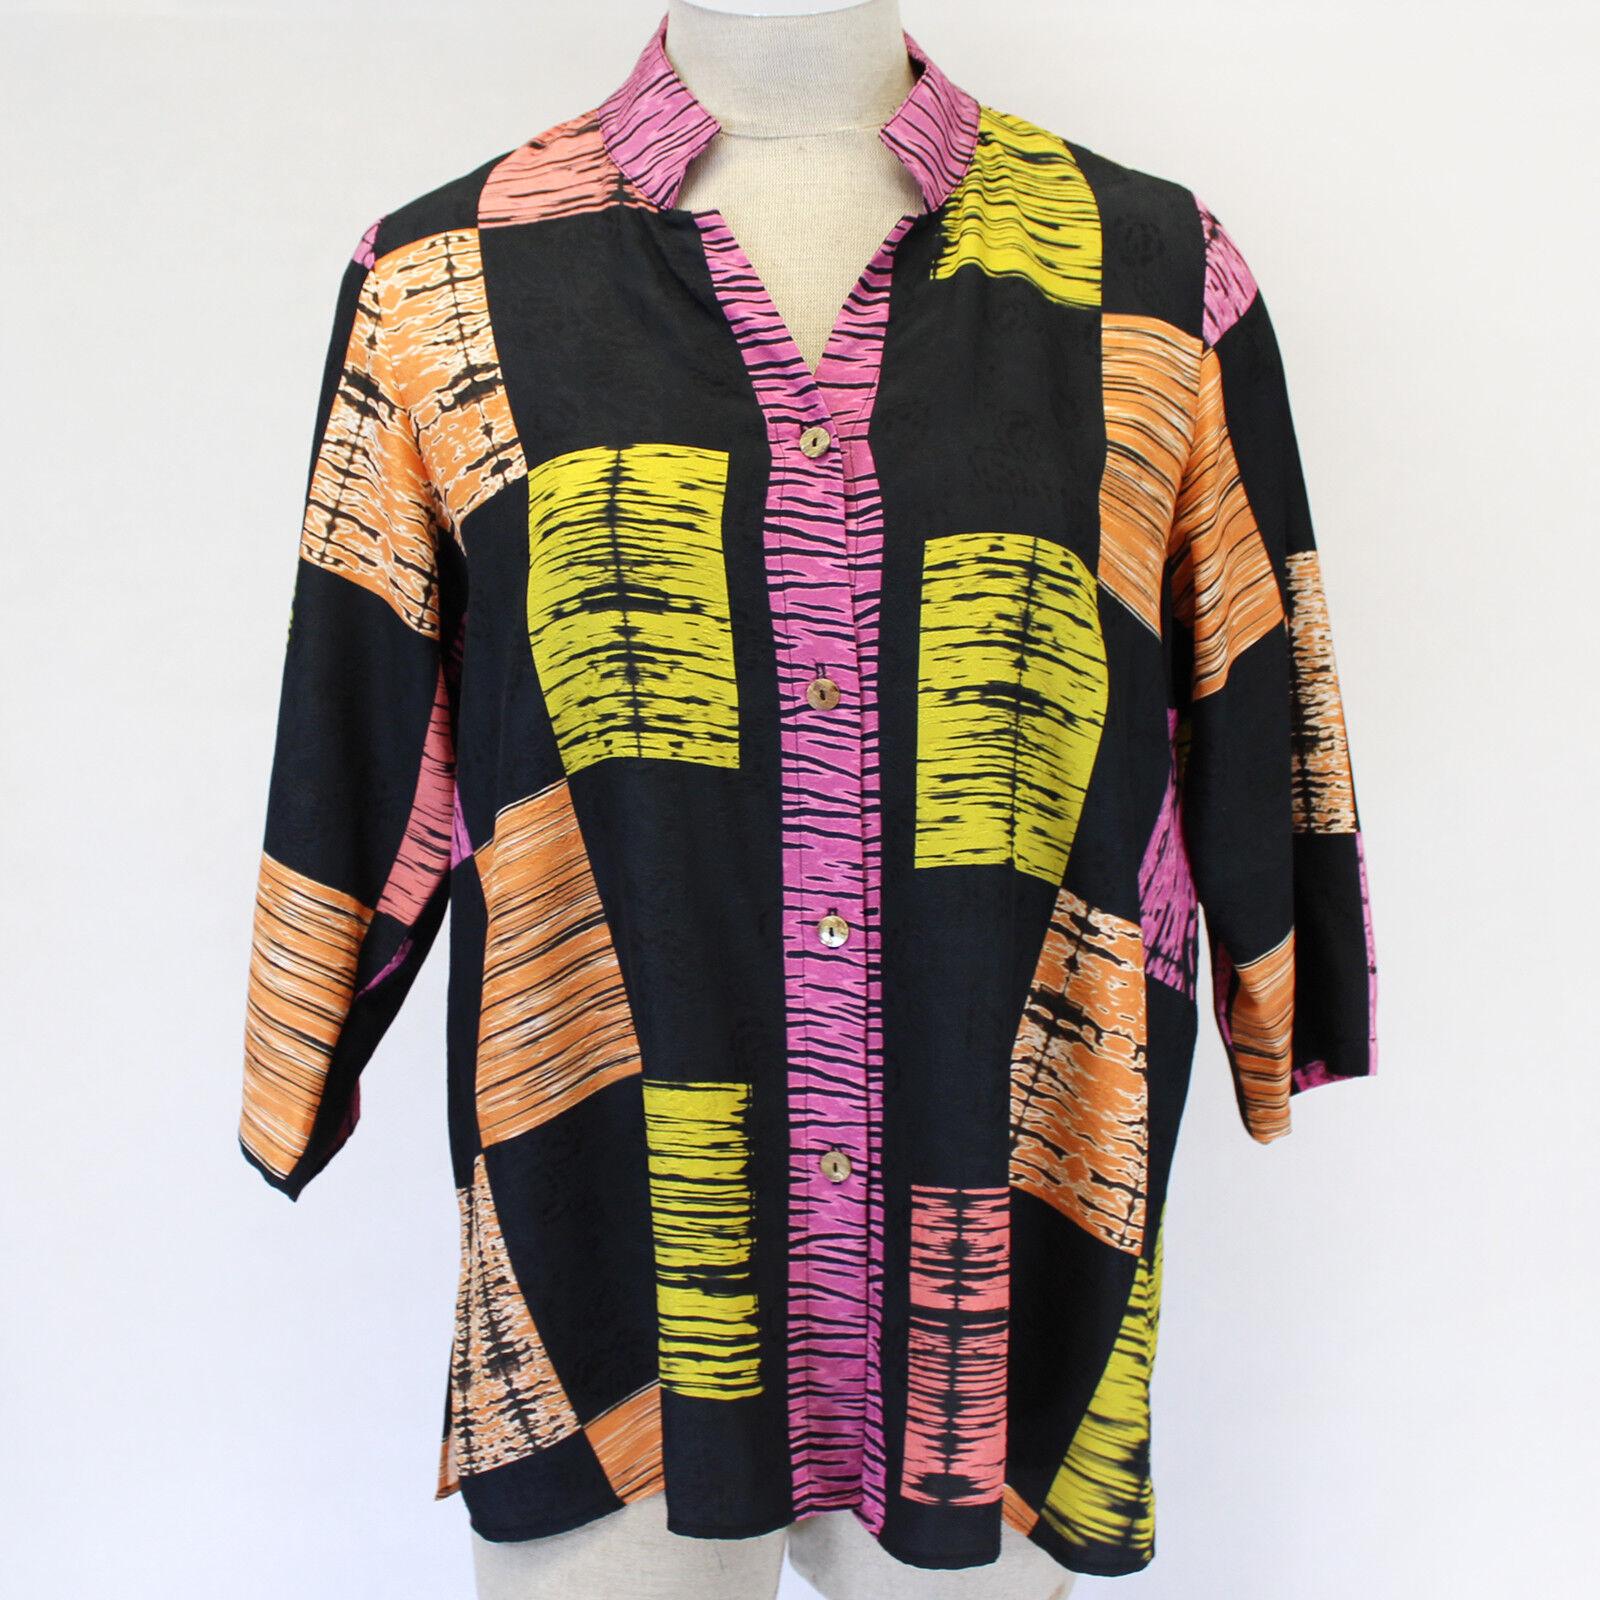 Citron Clothing Art to Wear Japanese Shibory Silk Blend Blouse Top Plus 3X